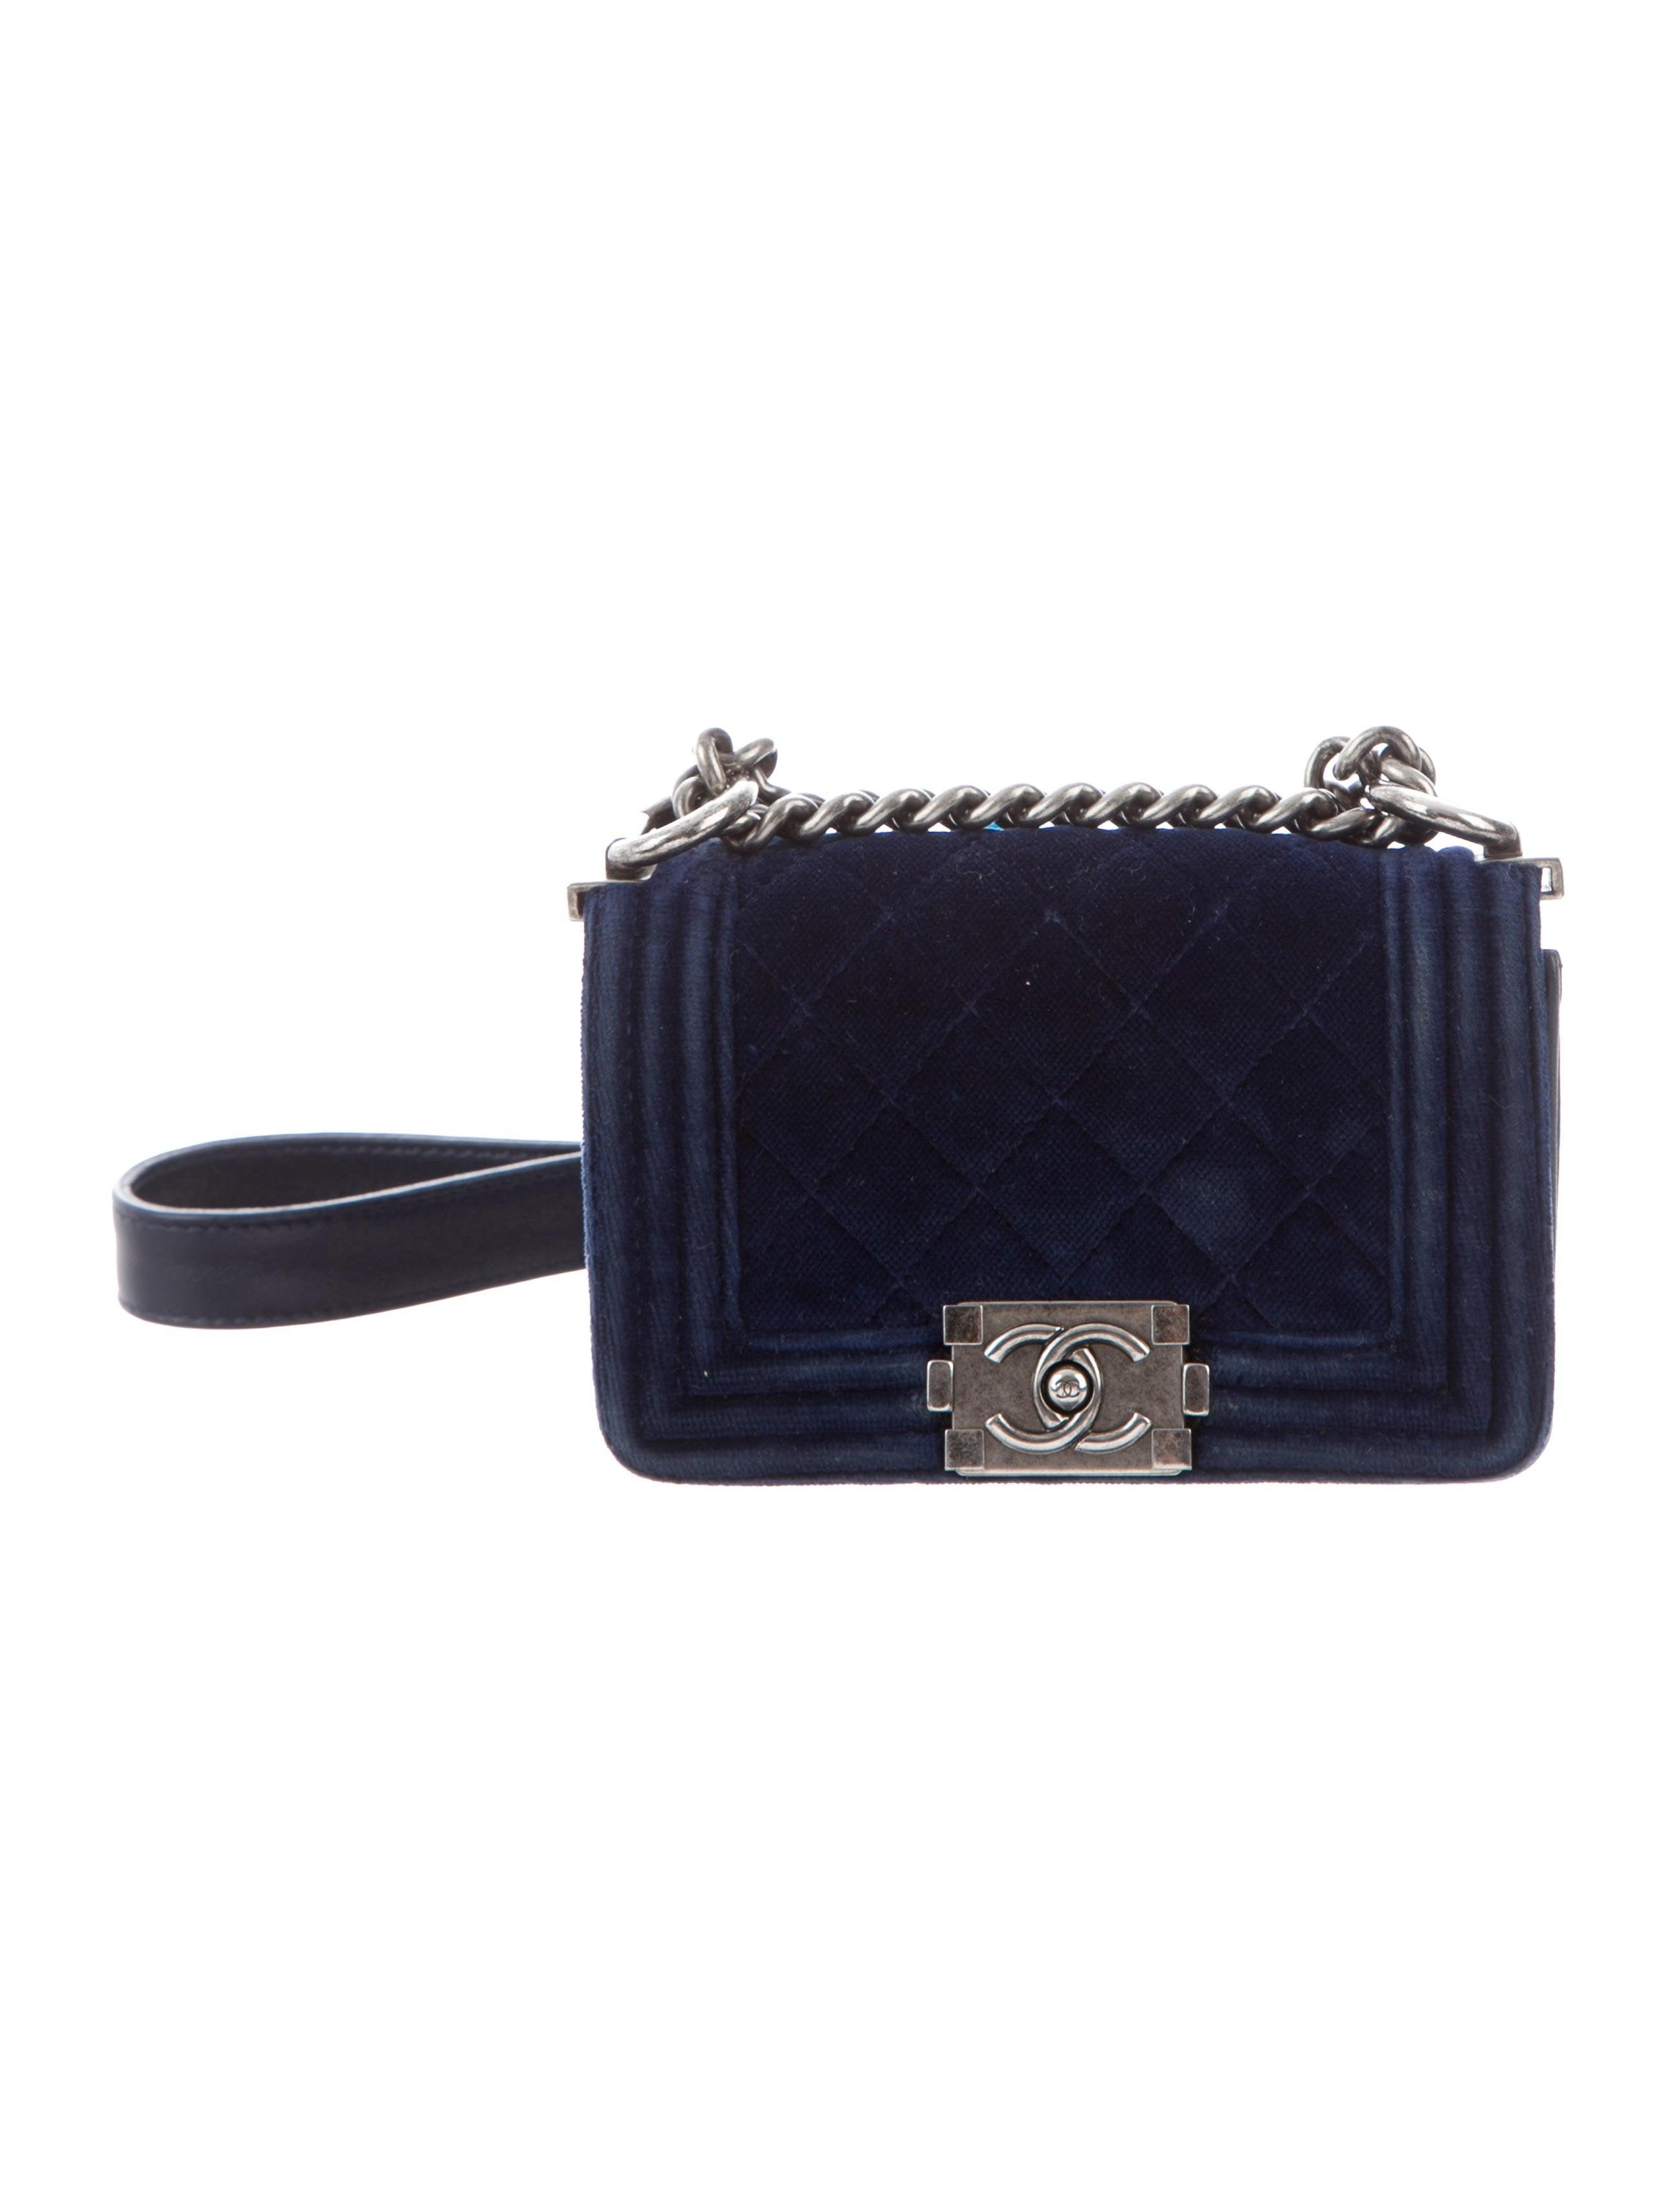 94c987ff183b Chanel Mini Velvet Boy Bag - Handbags - CHA298255 | The RealReal